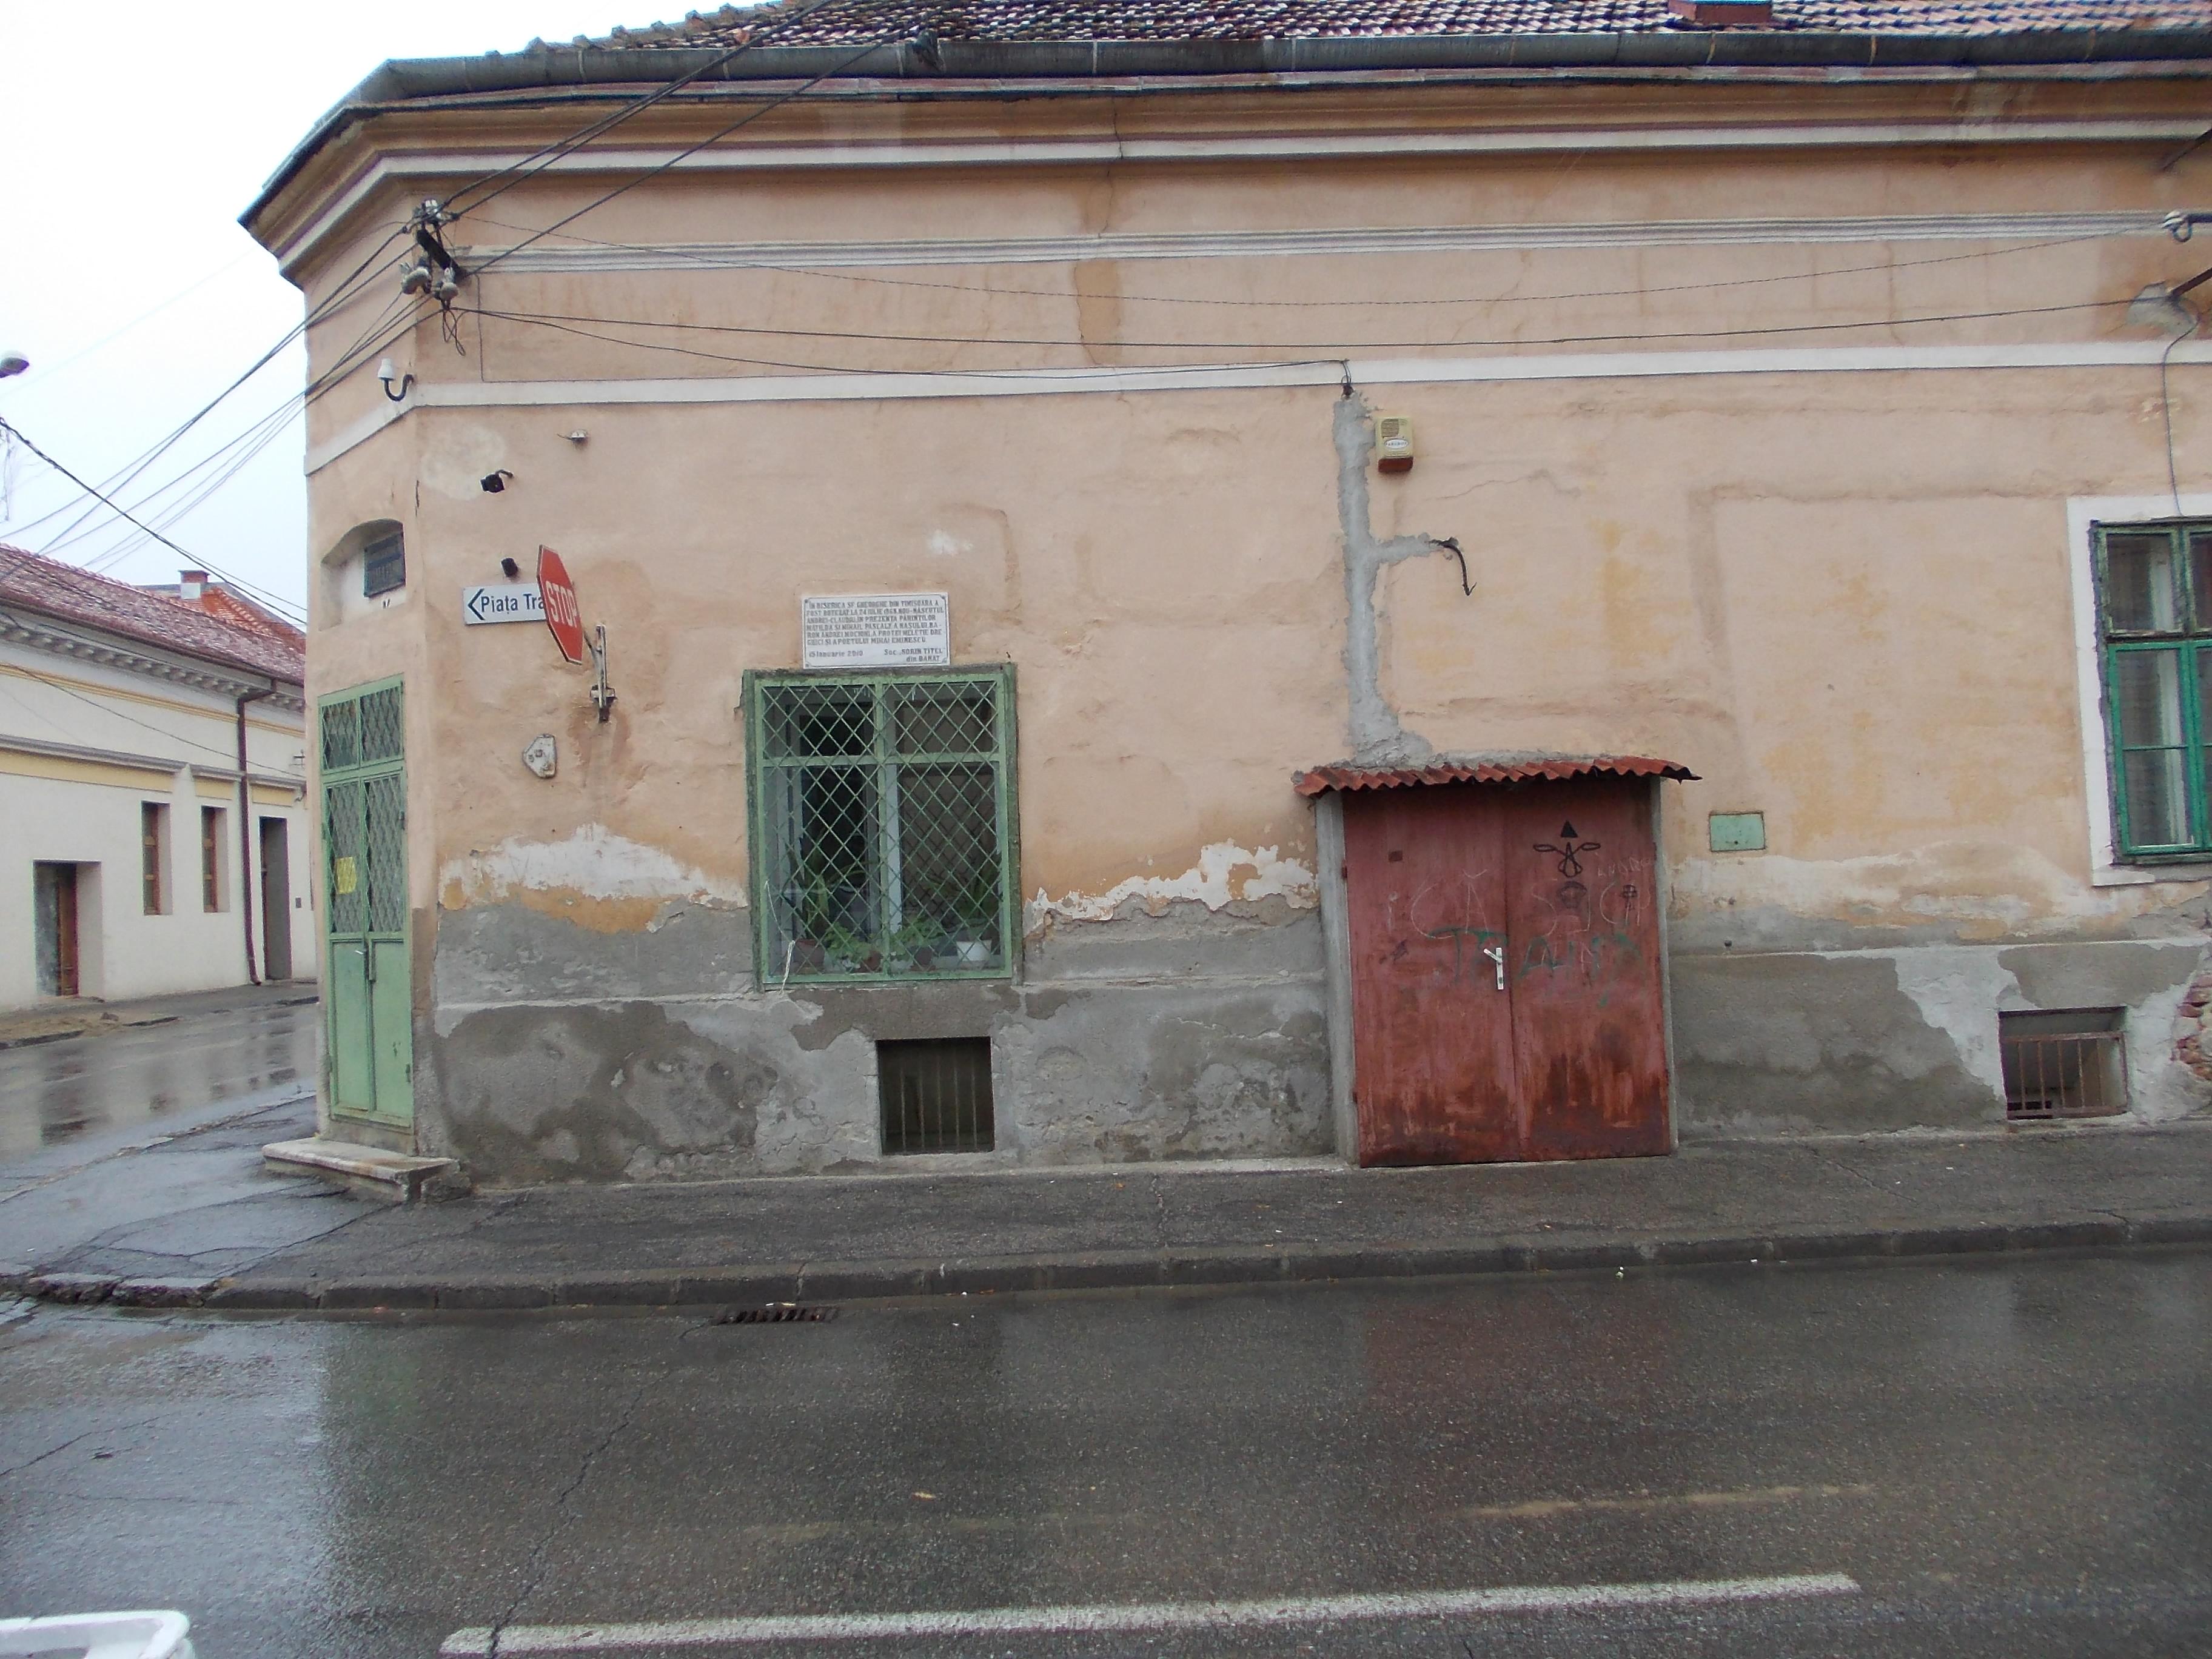 Timisoara, fara o evidenta a cladirilor cu risc seismic ridicat. Primaria paseaza responsabilitatea